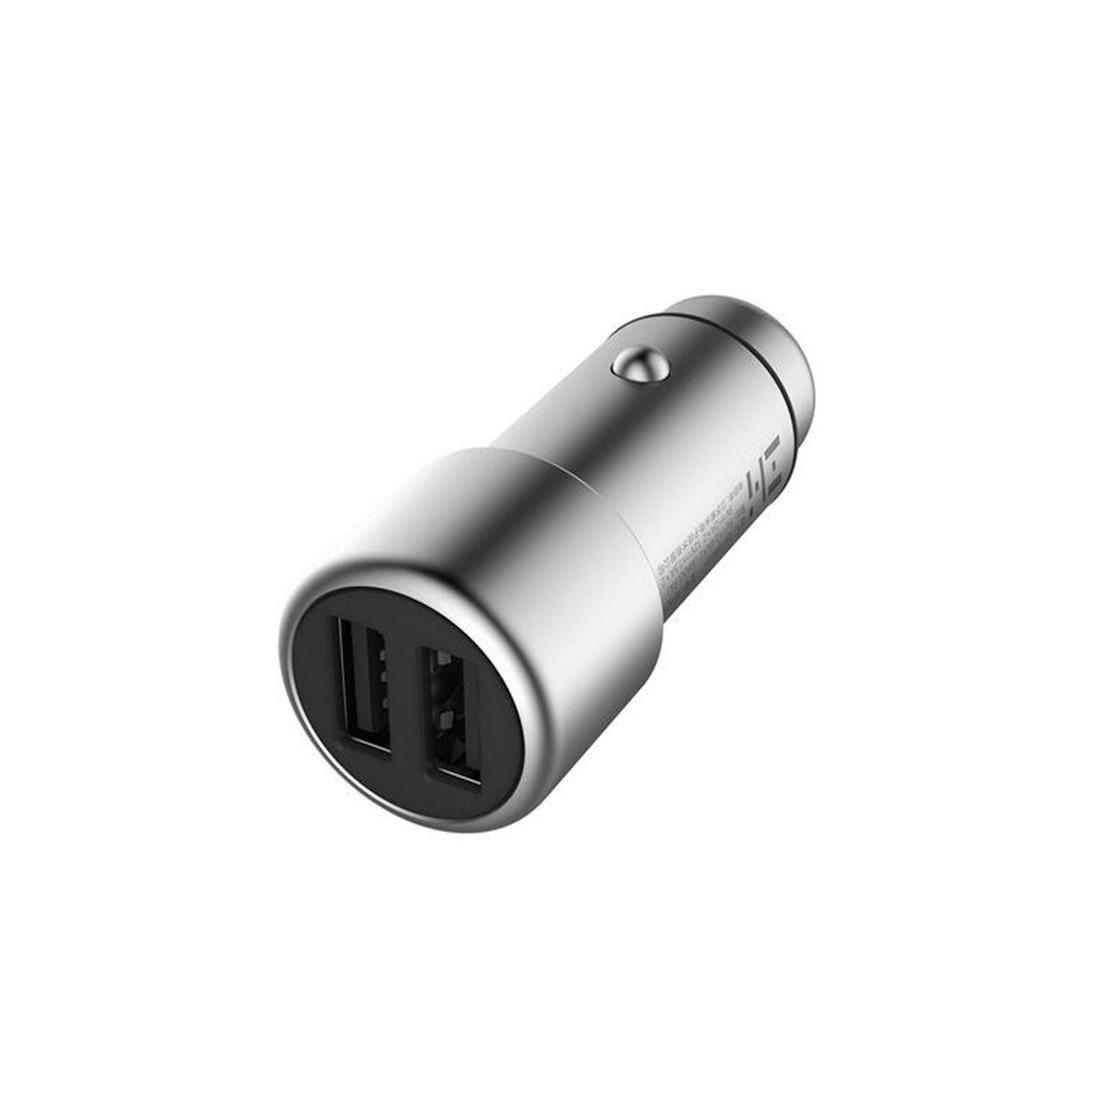 Xiaomi GDS4053СN Автомобильное USB зарядное устройство, V2 QC 3.0, ,4A*2 USB порта, LED-подсветка, Серебрист